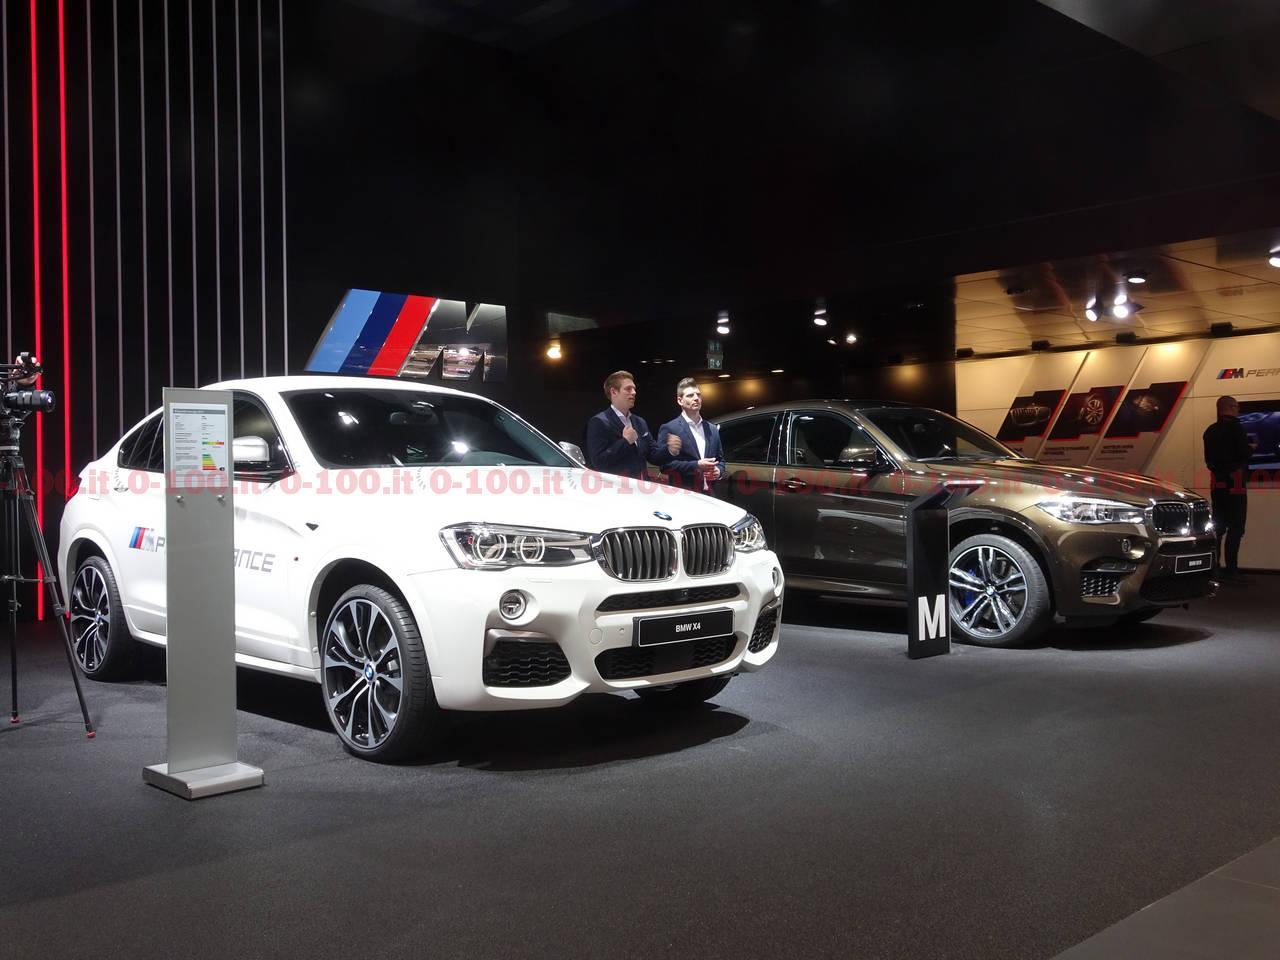 Ginevra-geneva-geneve-2017-BMW-x4-0-100_1